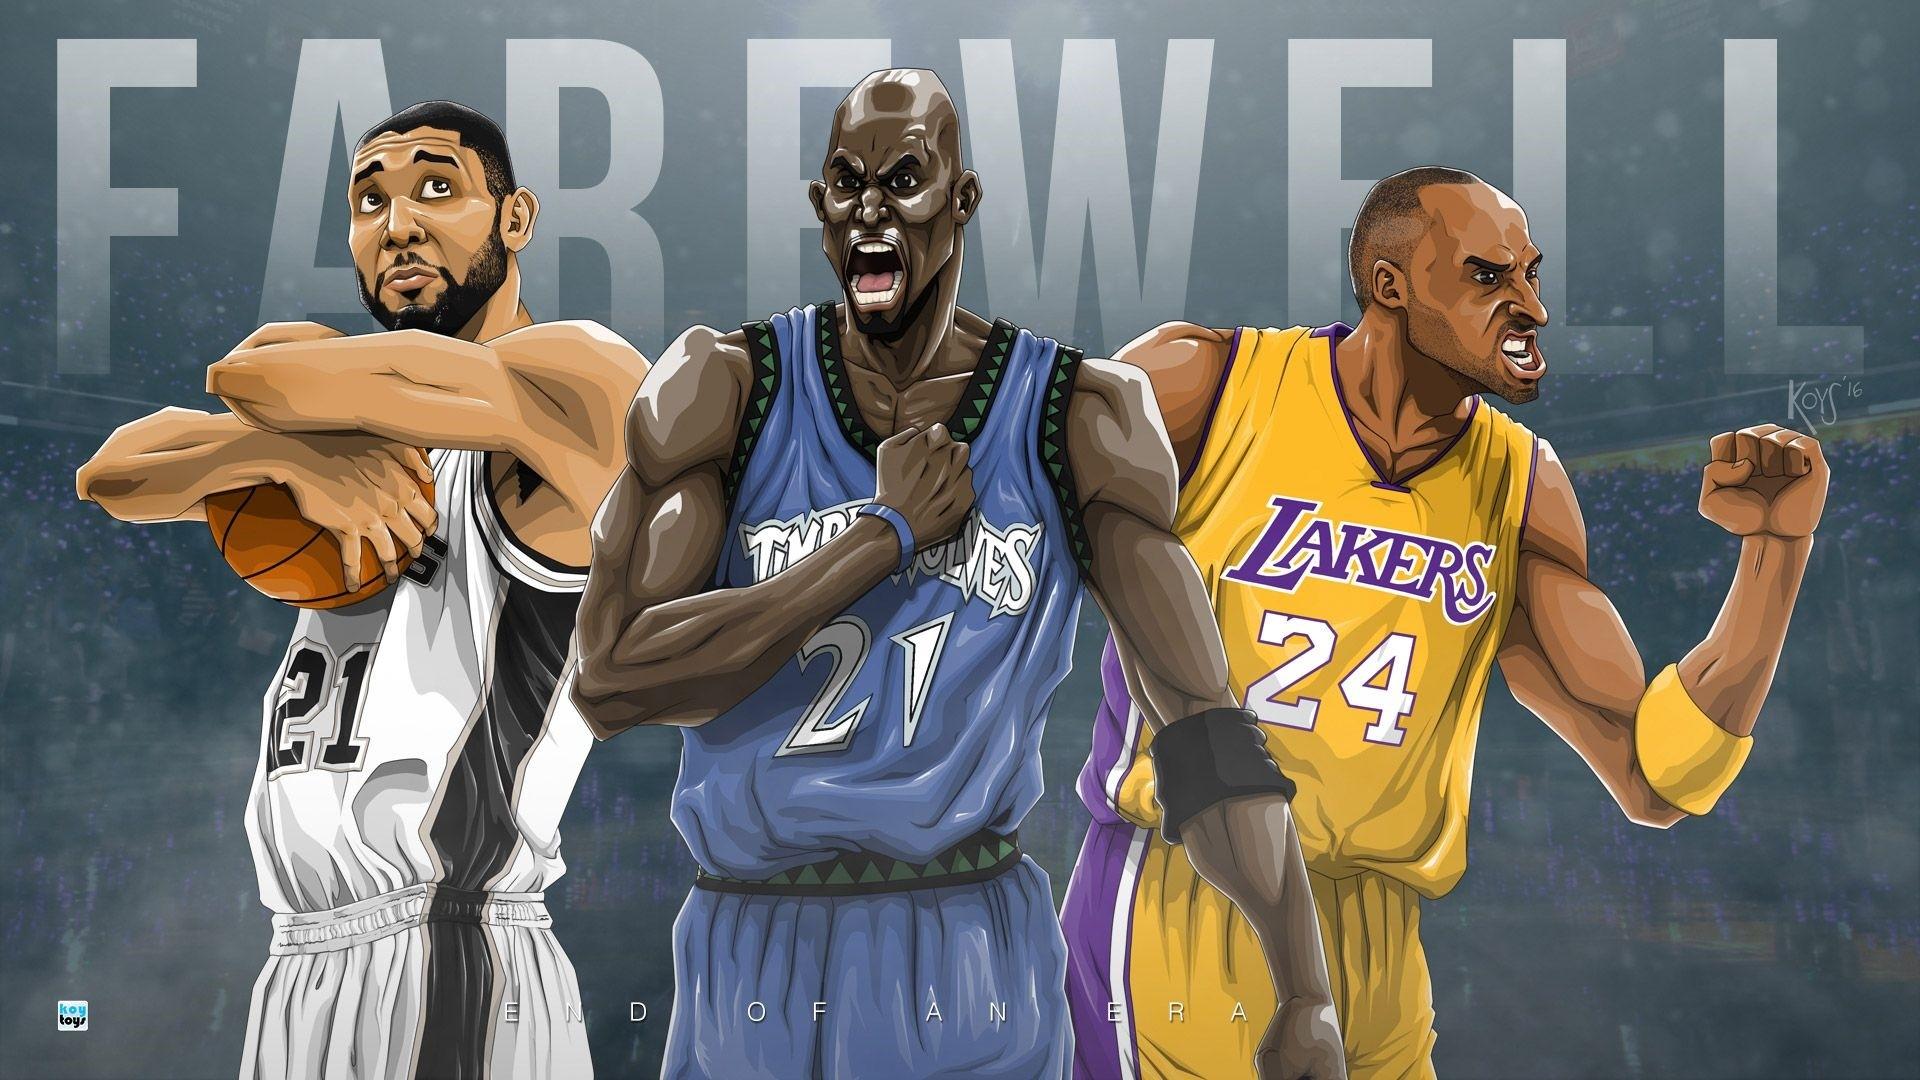 Cartoon Basketball Wallpaper Picture hd